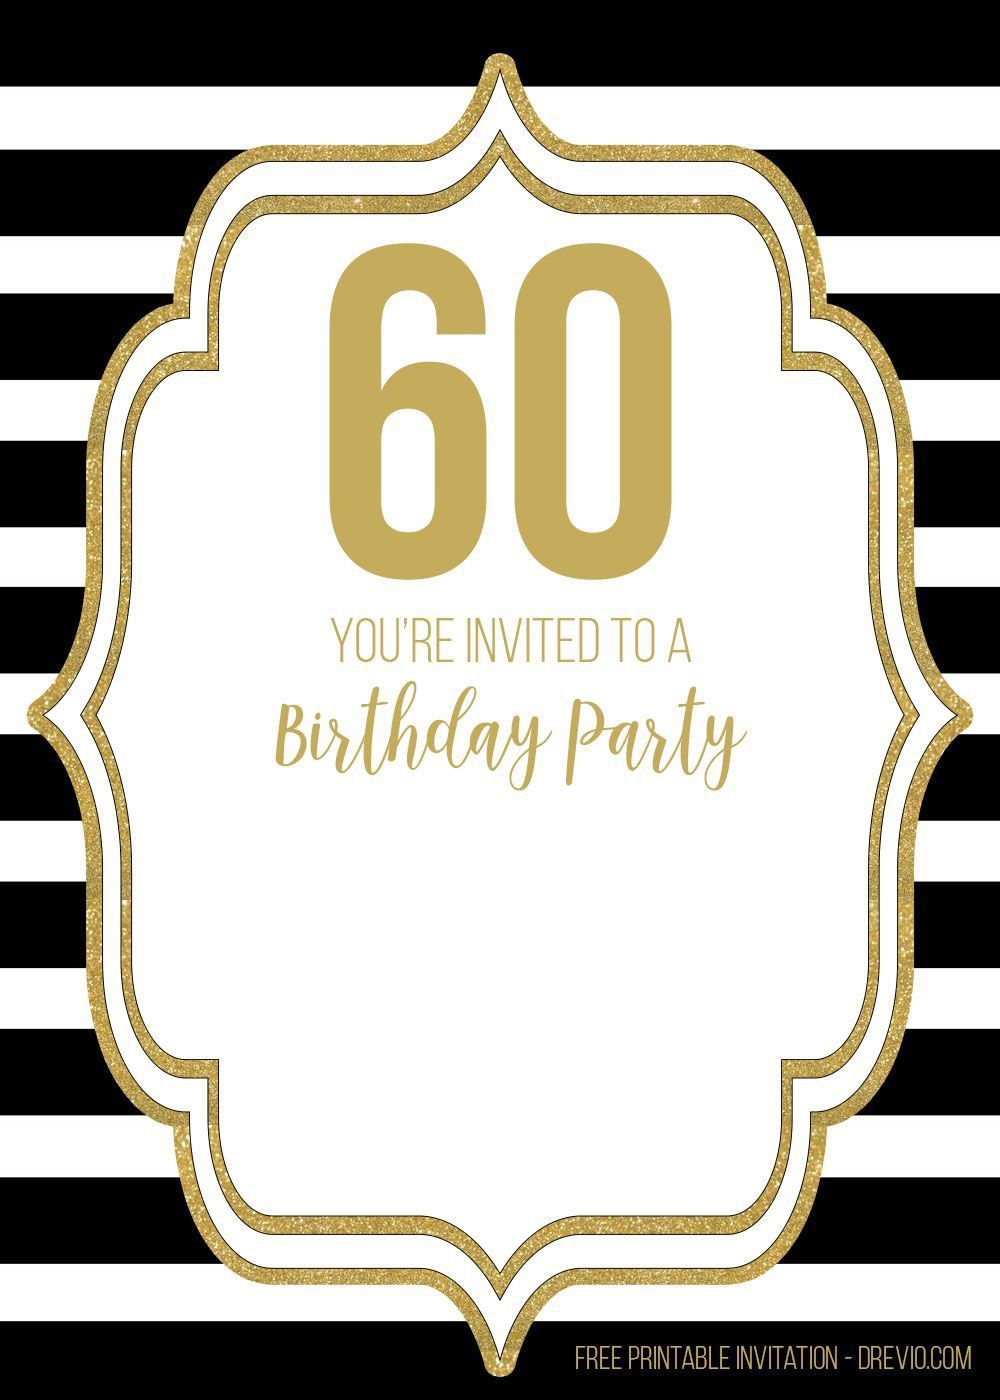 007 Unusual 60 Birthday Invite Template High Definition  Templates 60th Printable FreeFull